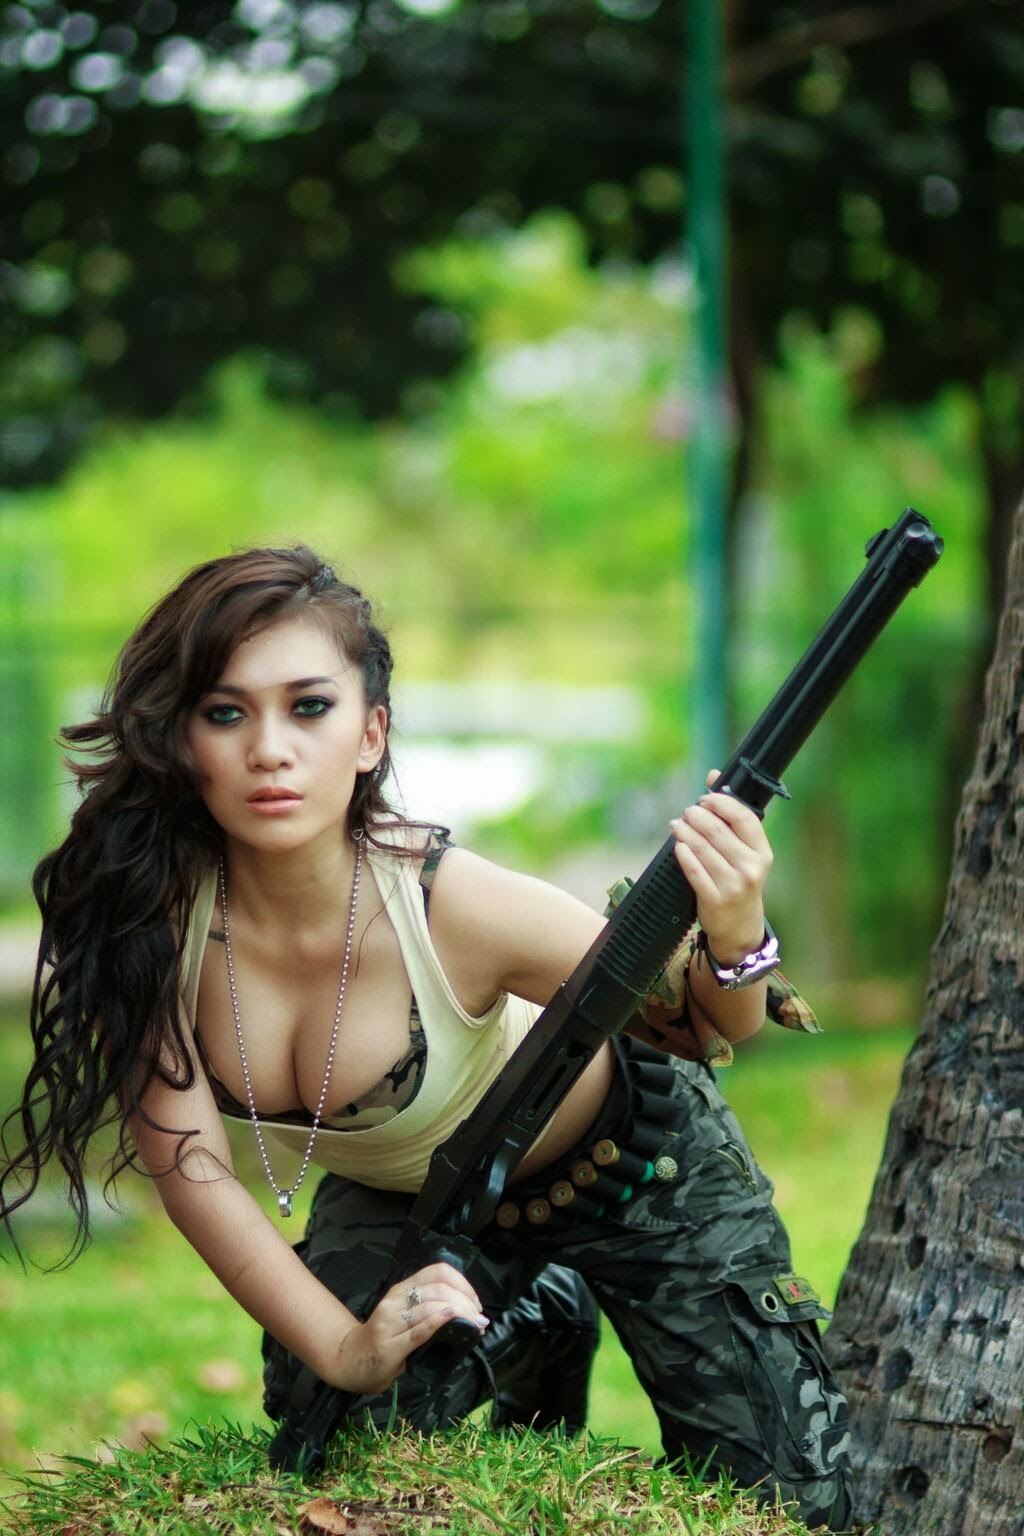 Photoshoot Audrey June Diablo Model Galeri Foto Cewek Abg Igo Artis